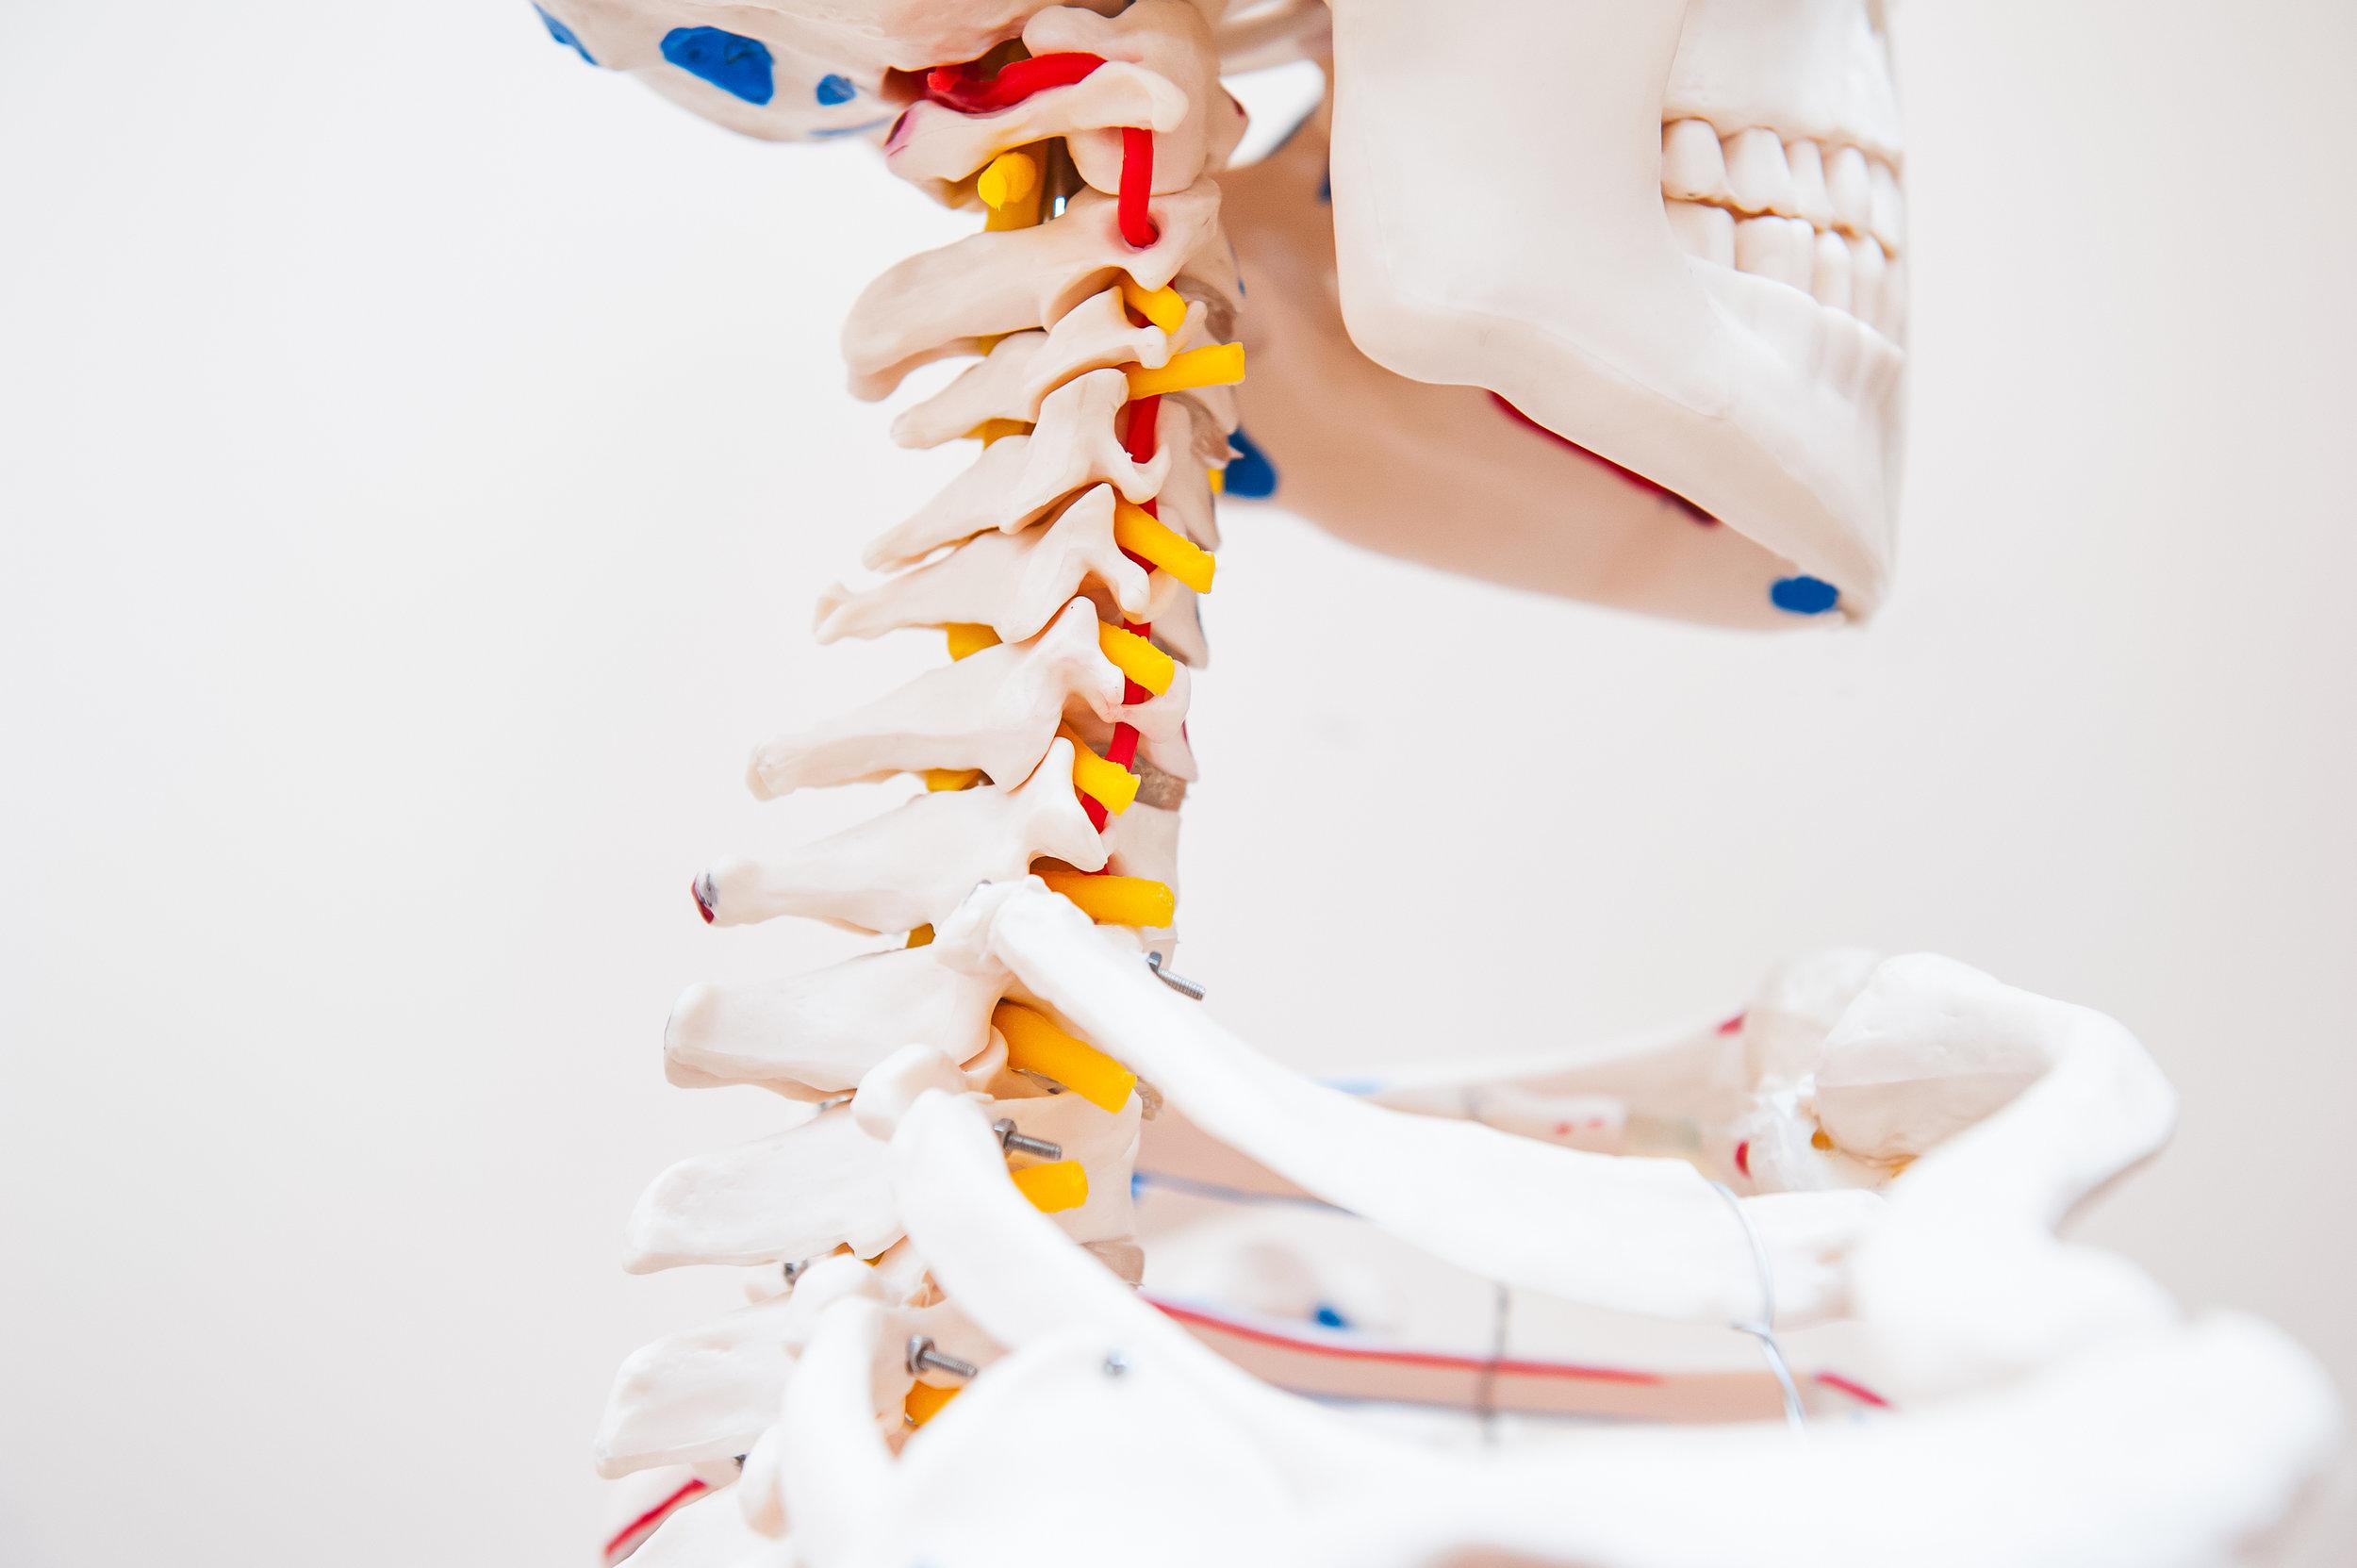 bigstock-Close-Up-Side-View-Human-Skele-166086356.jpg